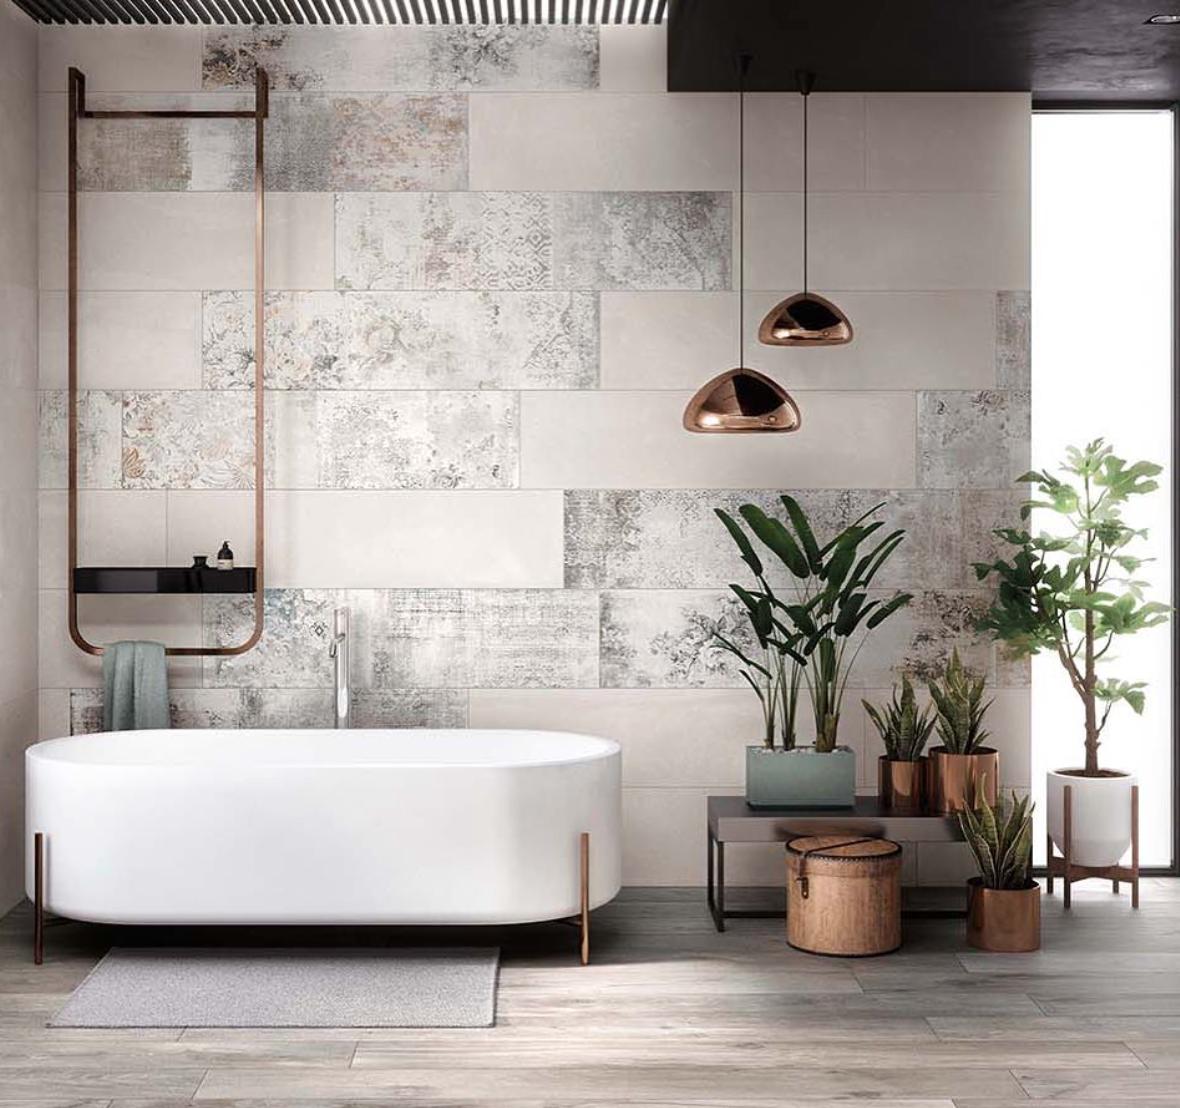 15 Most Beautiful Bathrooms on Pinterest-Modern bathroom design-Zen ...